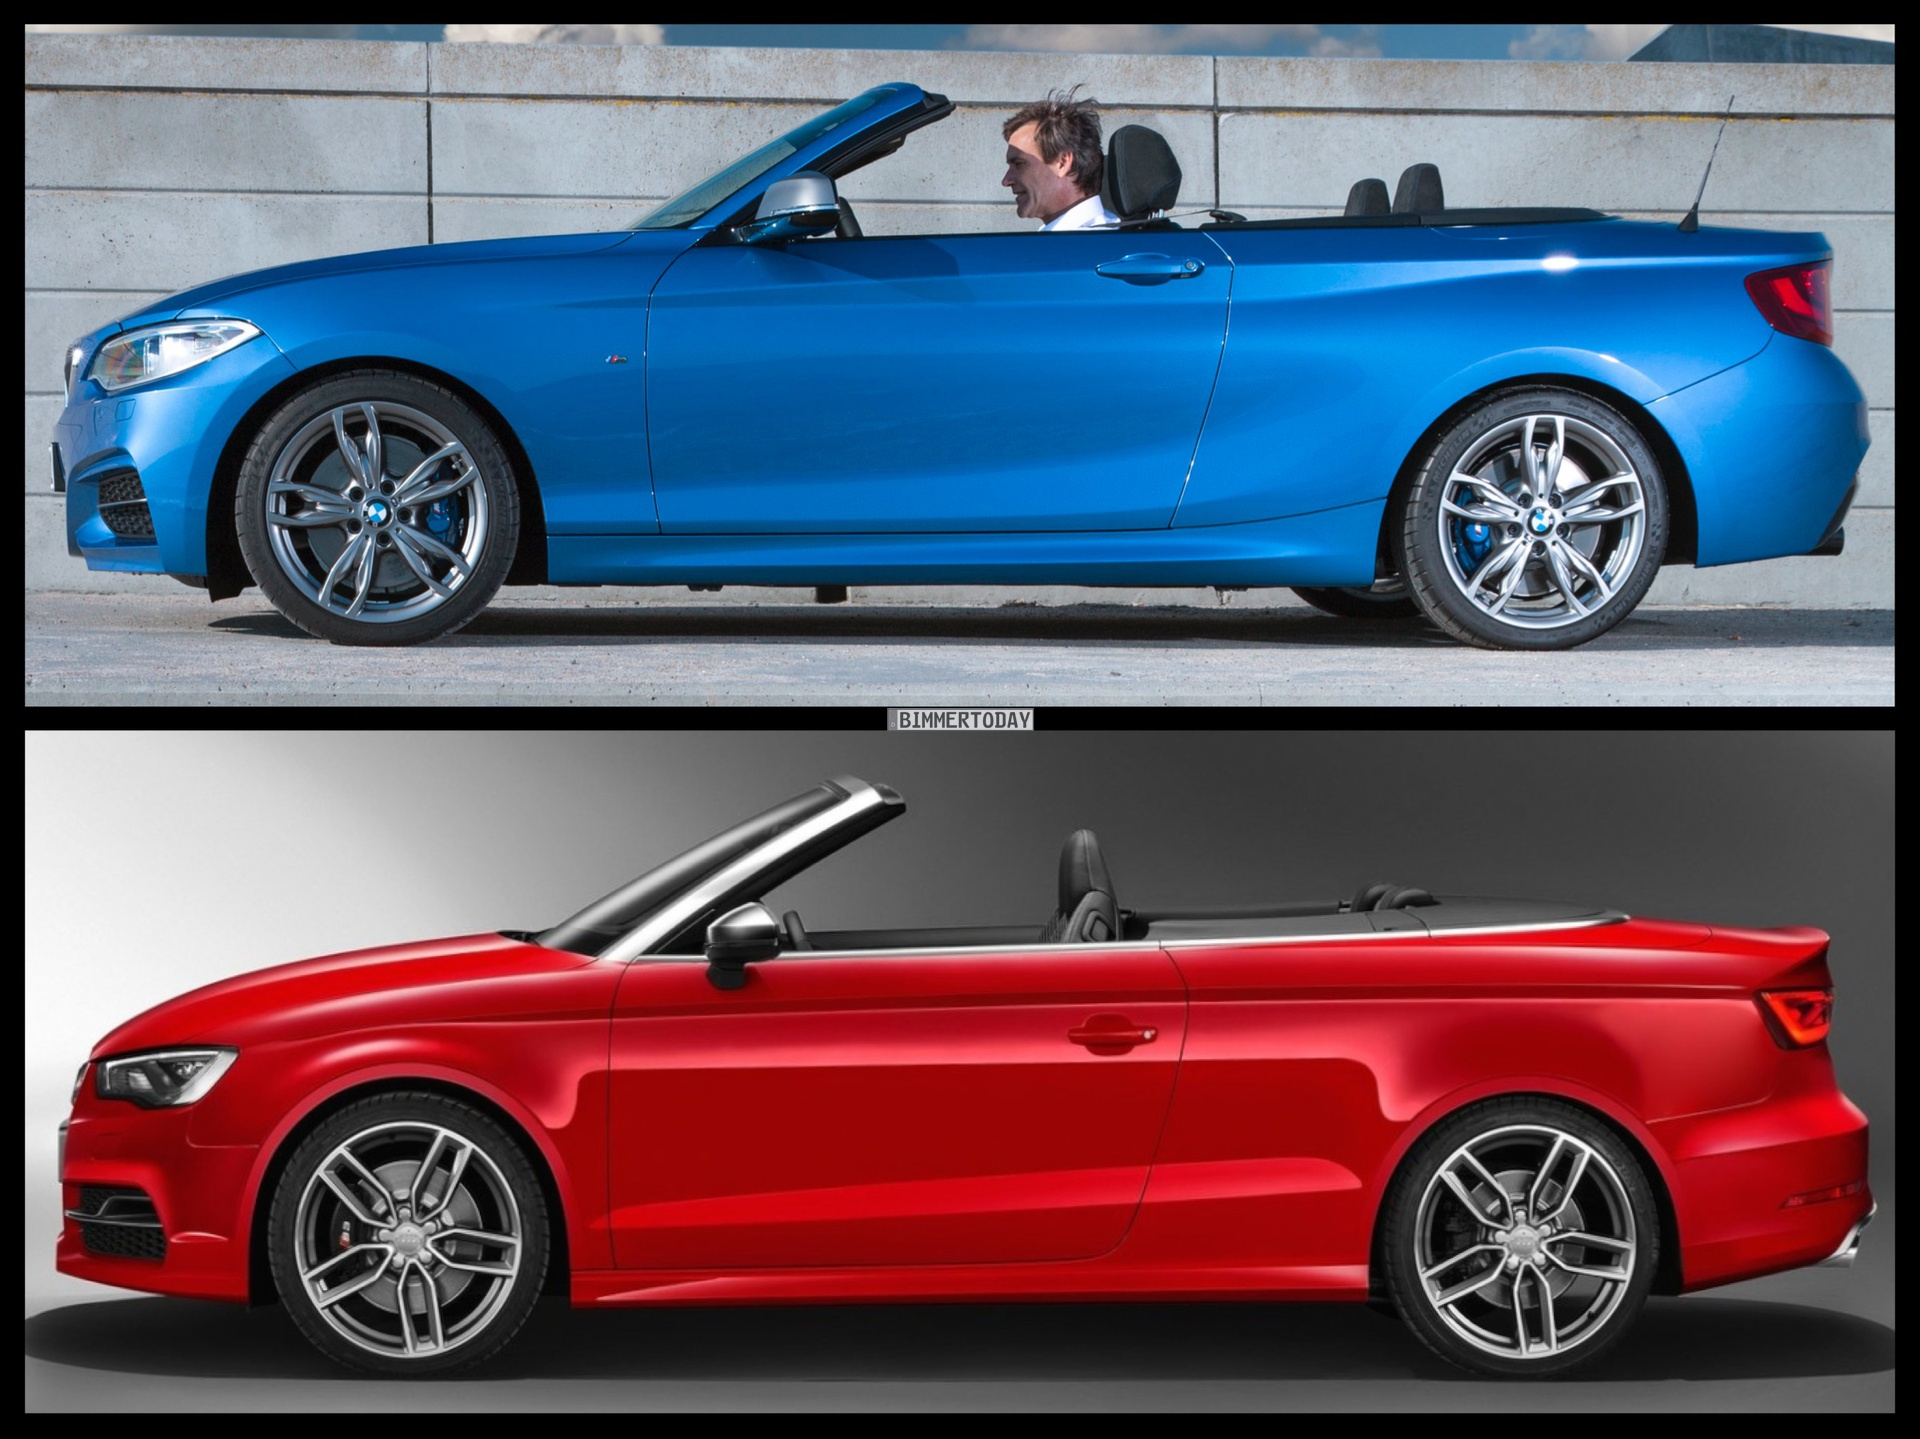 BMW M235i F23 wallpapers, Vehicles, HQ BMW M235i F23 ...